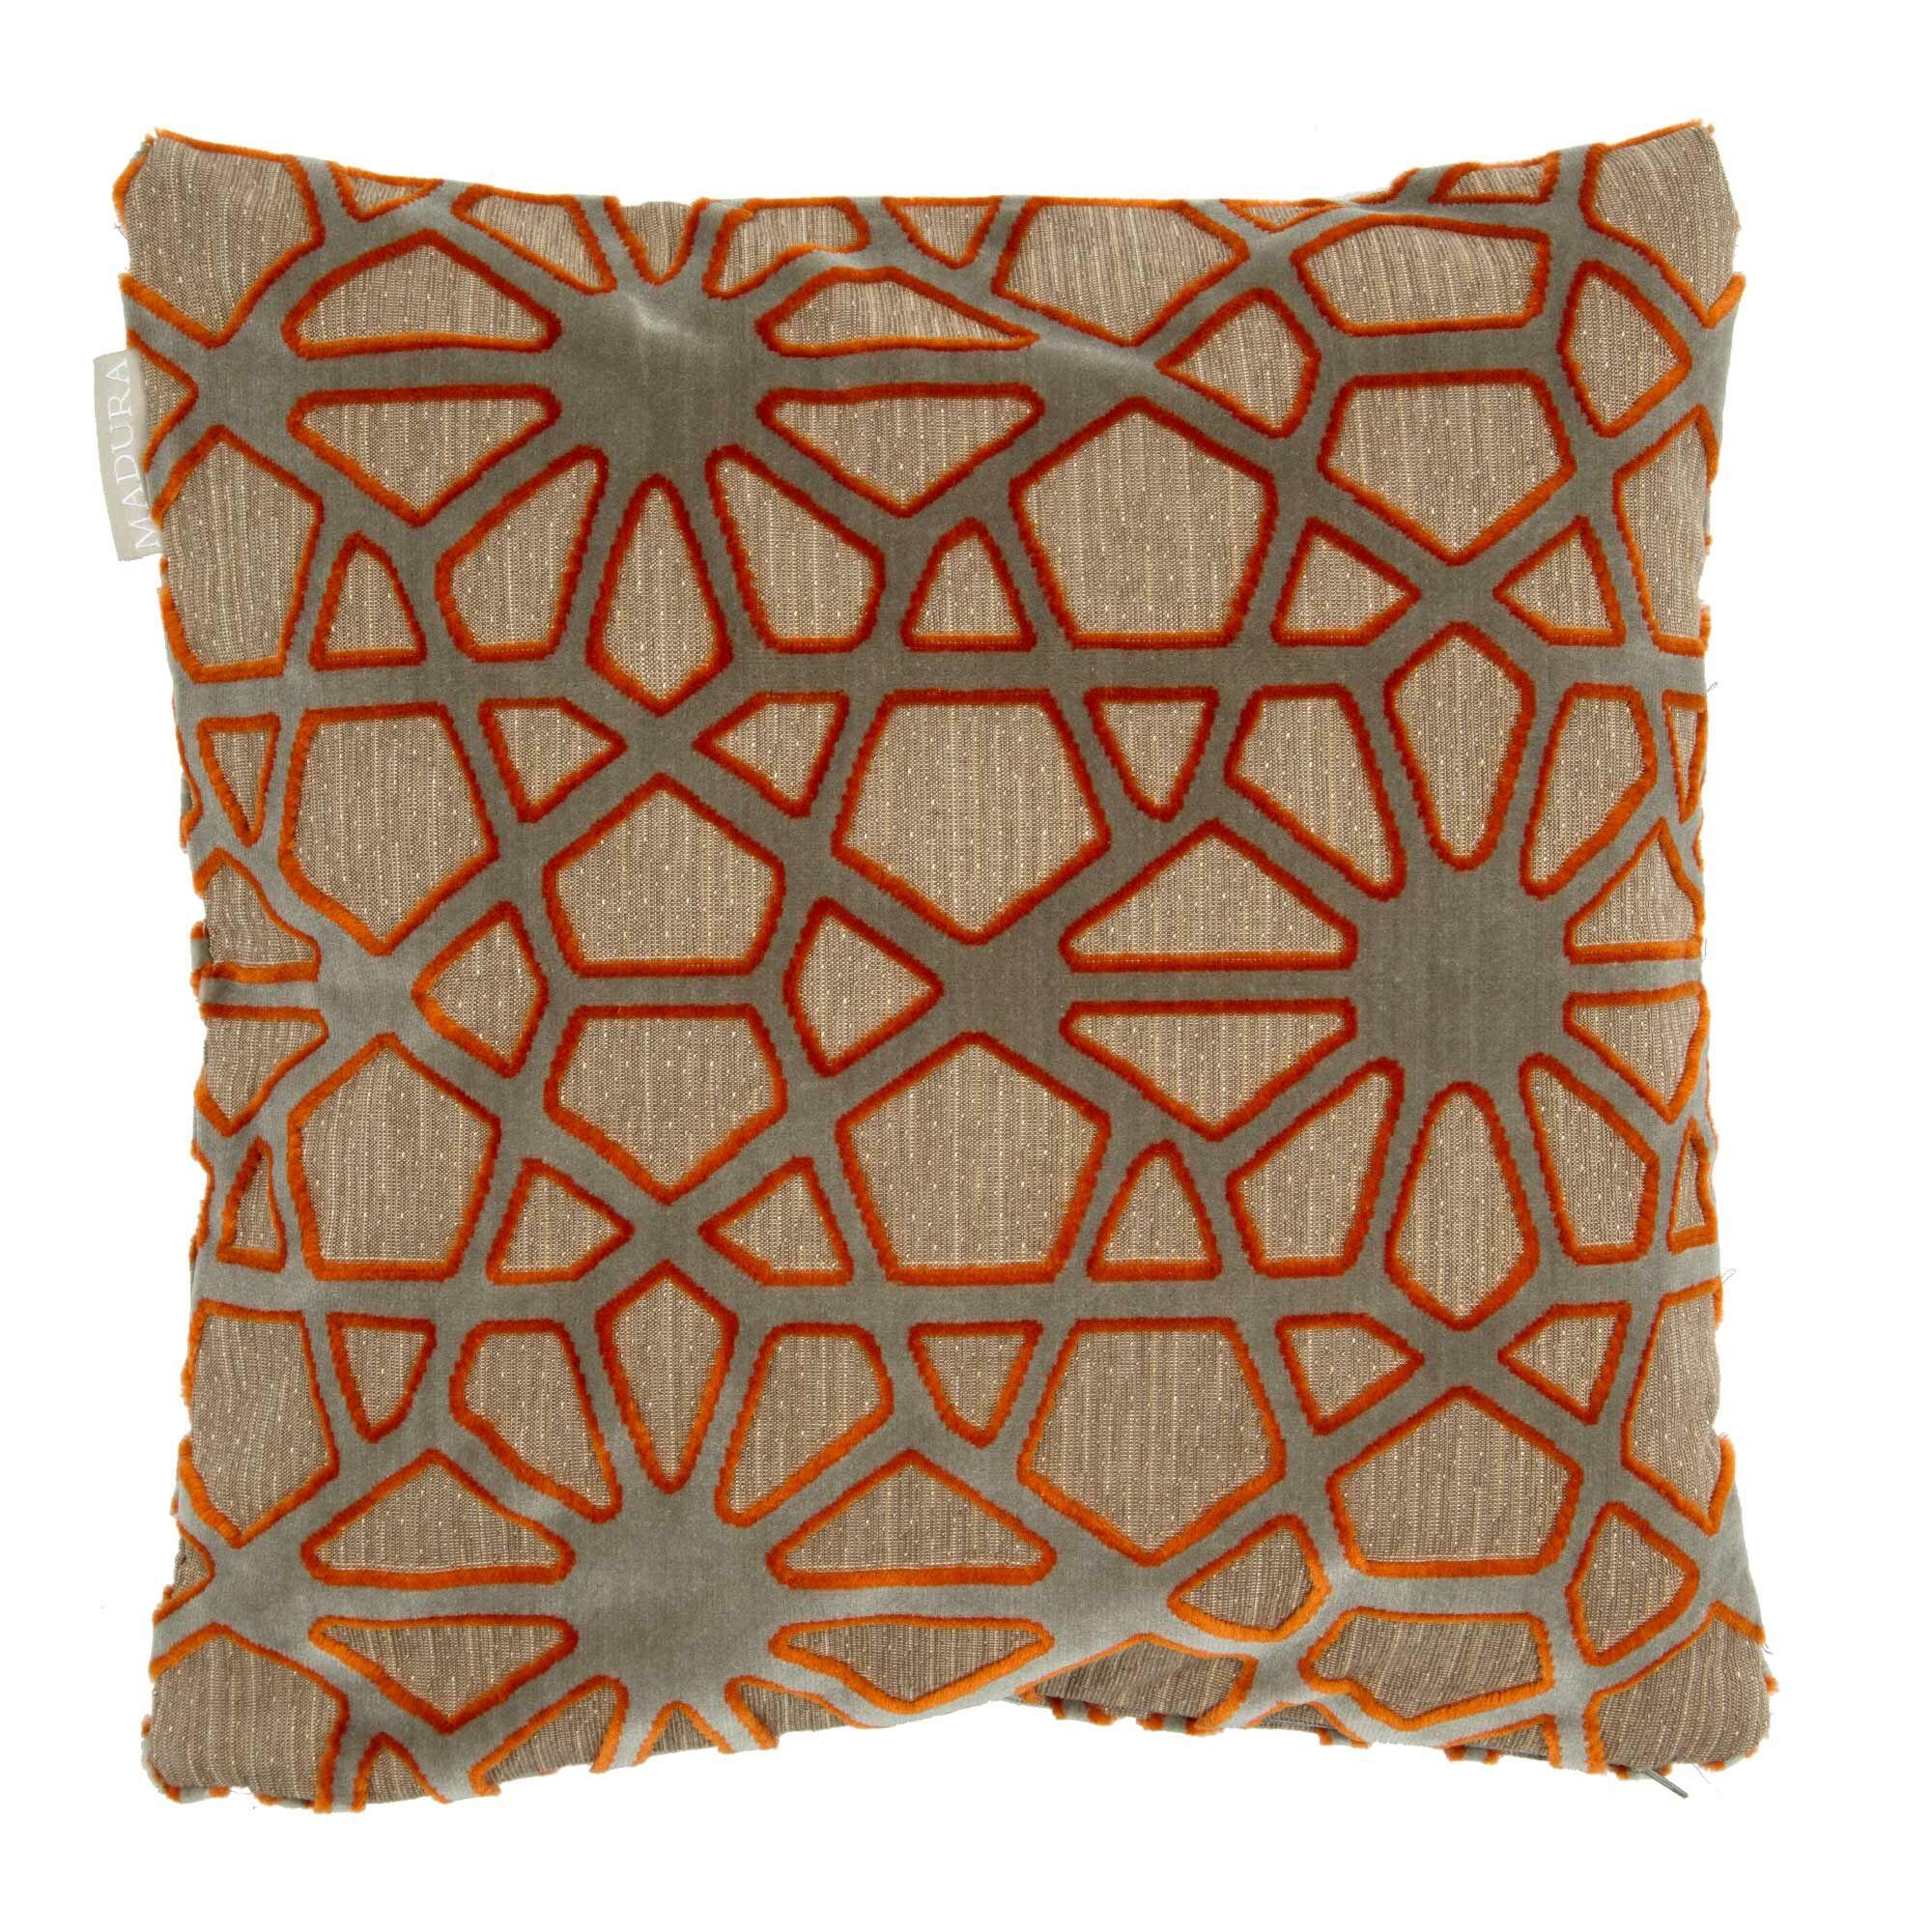 Mahogany Pillow Cover